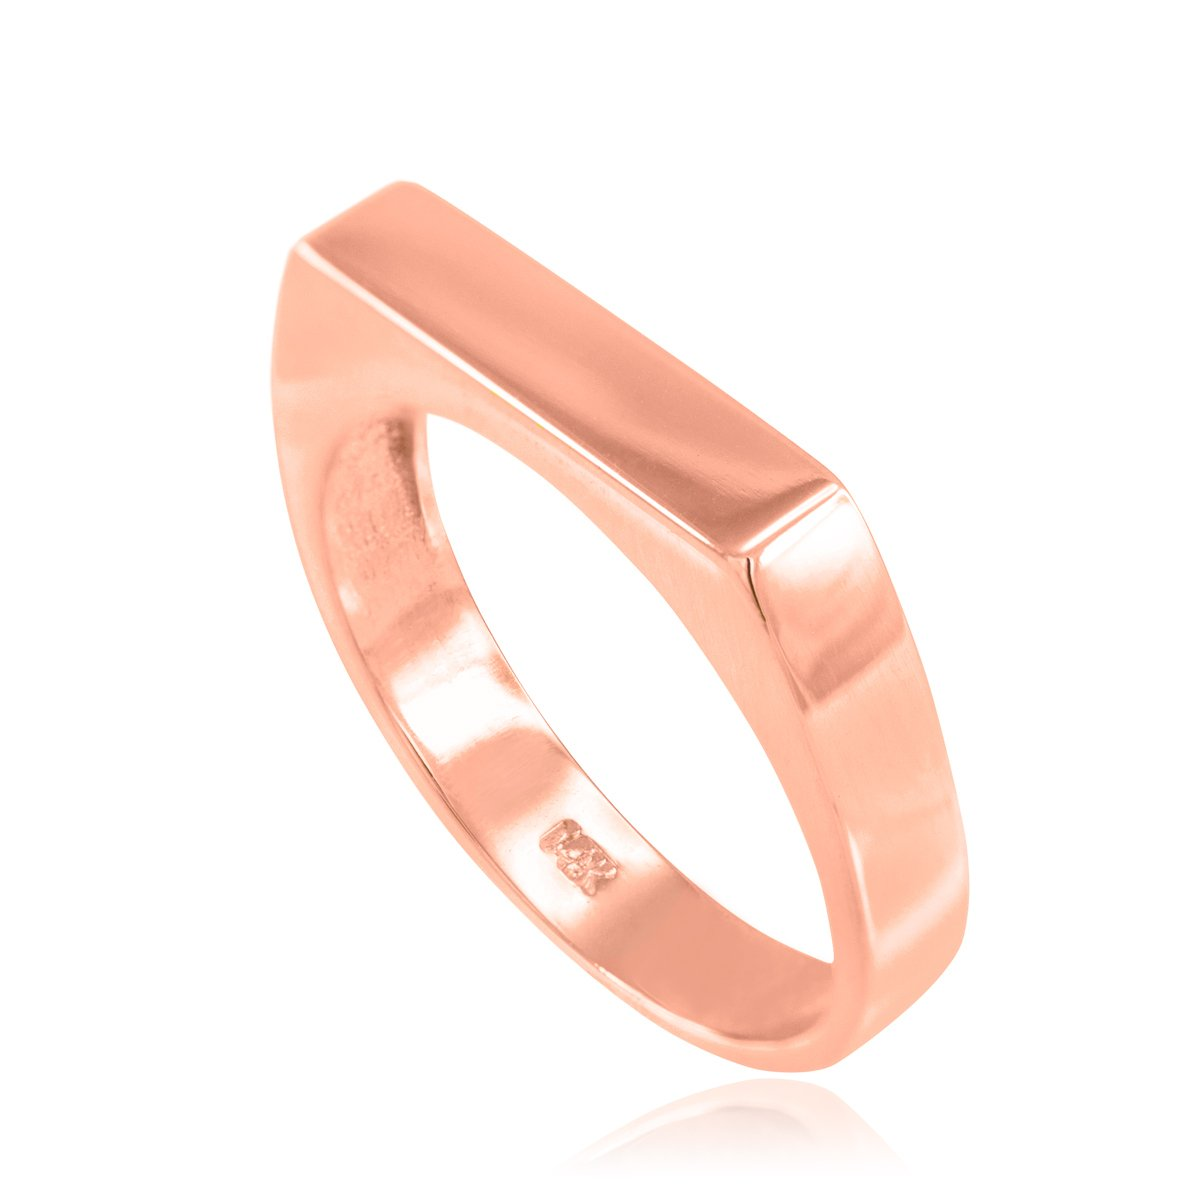 Stackable 14k Rose Gold Custom Engravable Flat Top Signet Ring (Size 9.75)